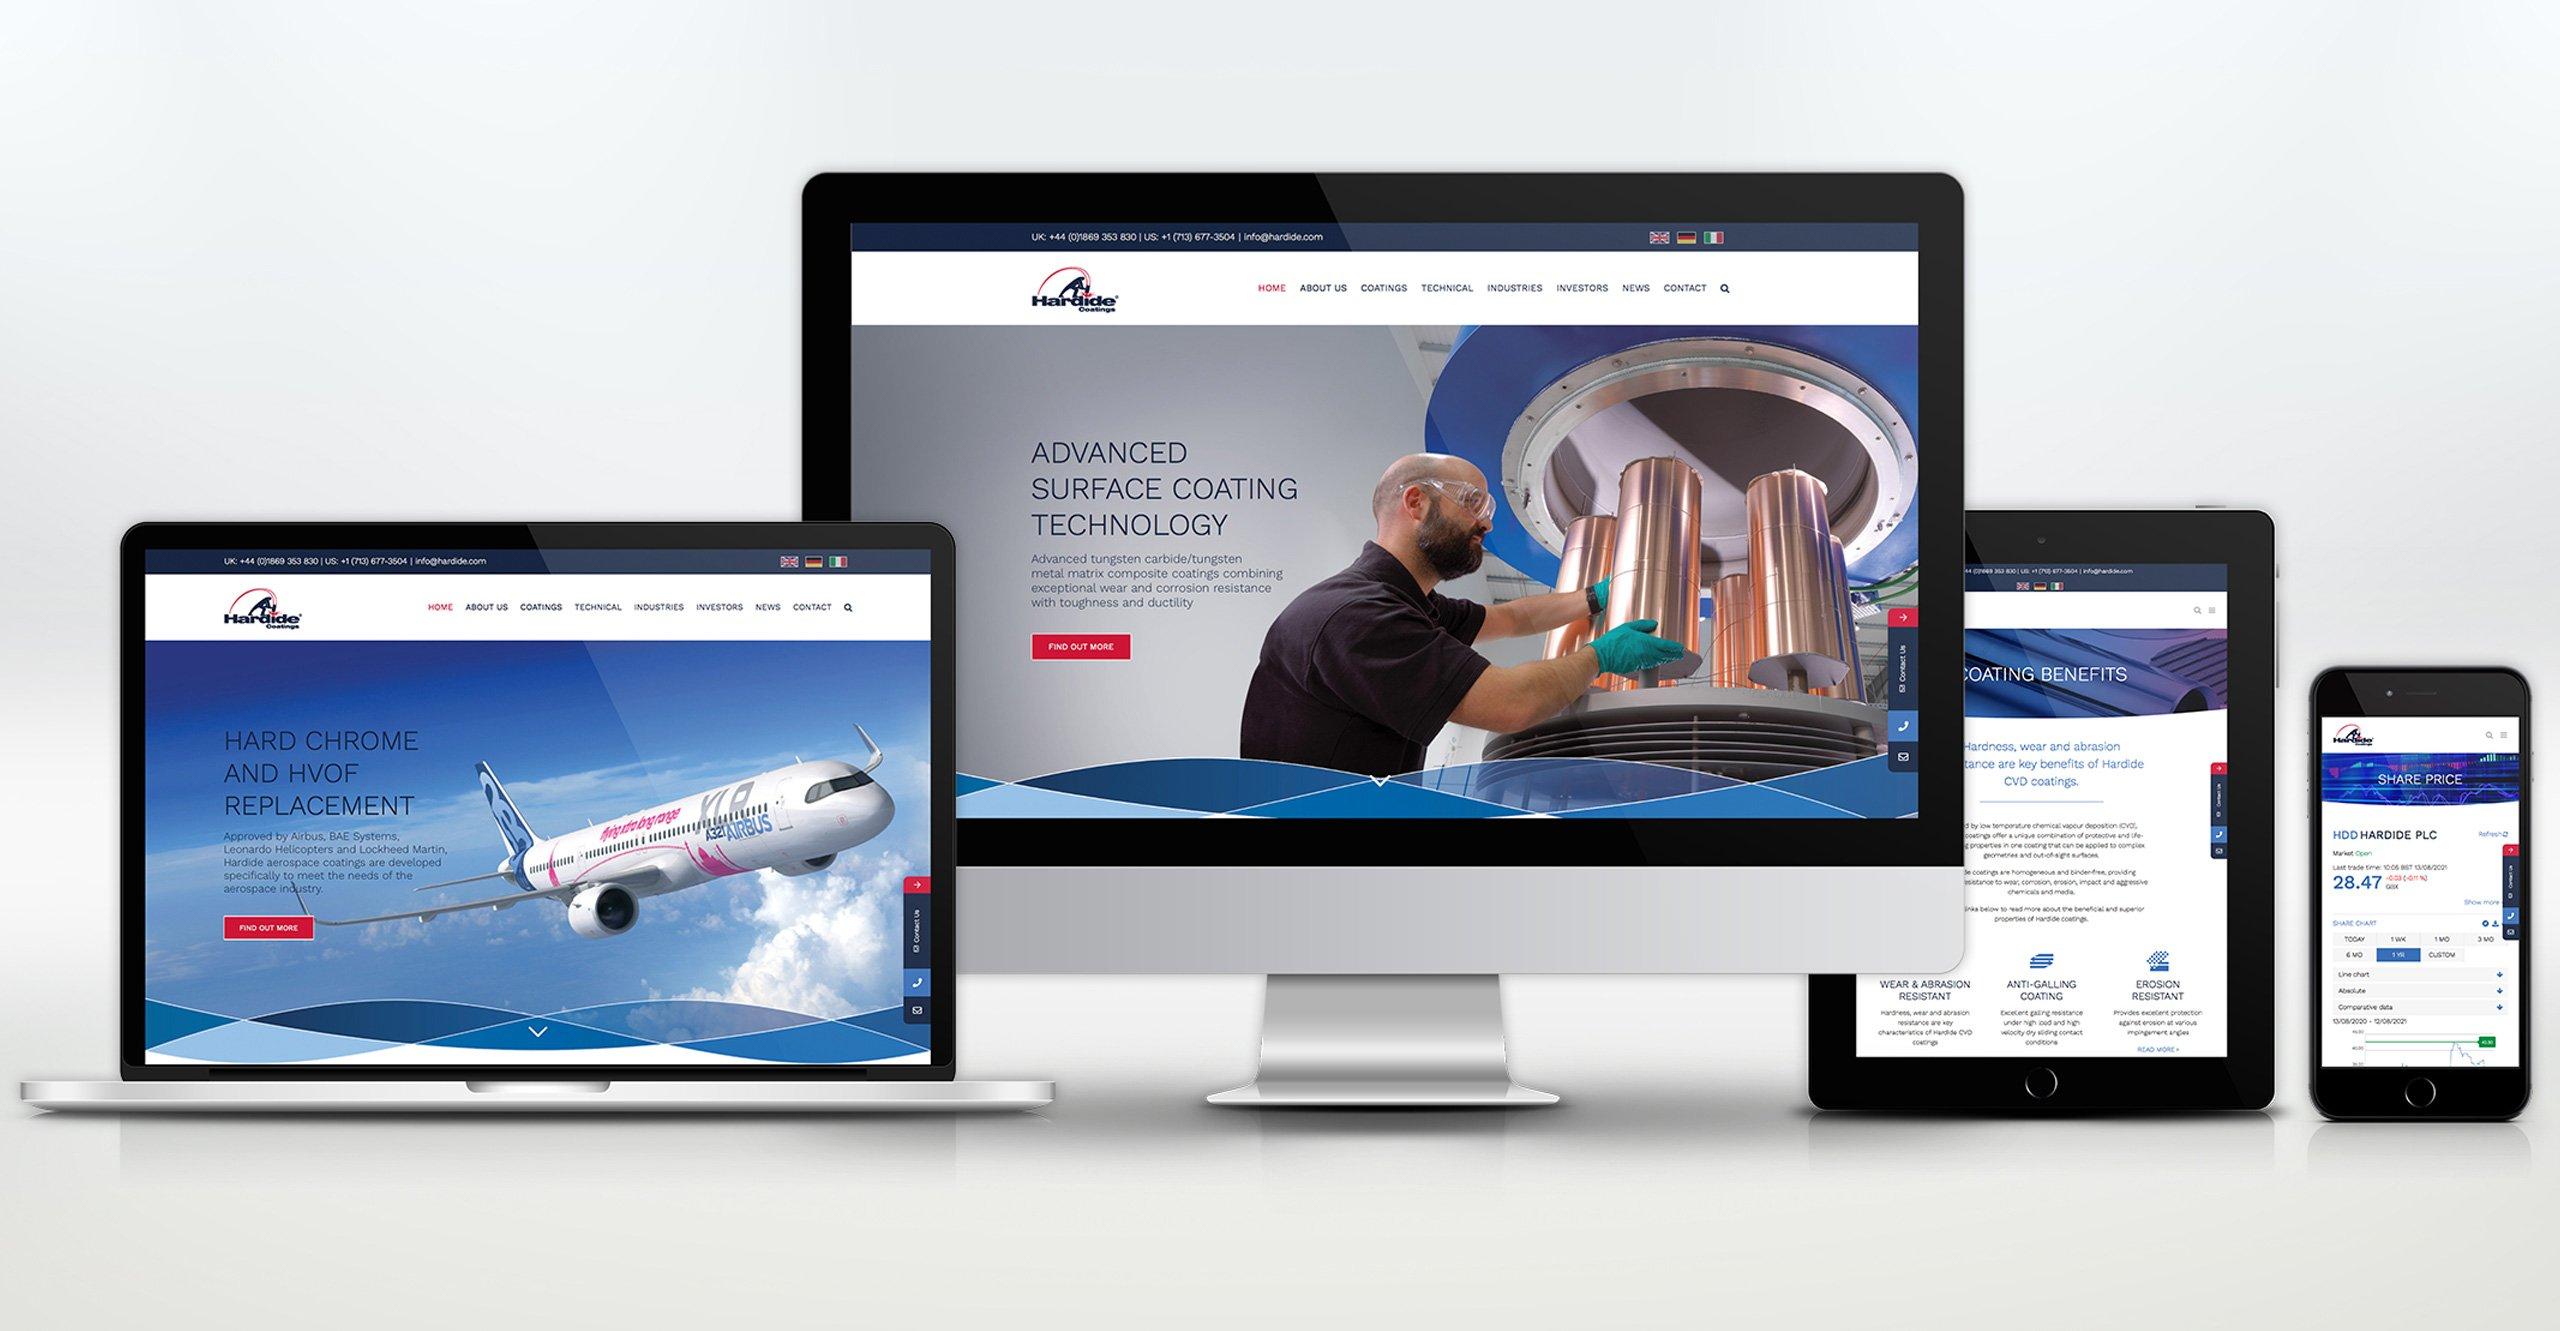 Website Design by Veucom - Hardide Coatings